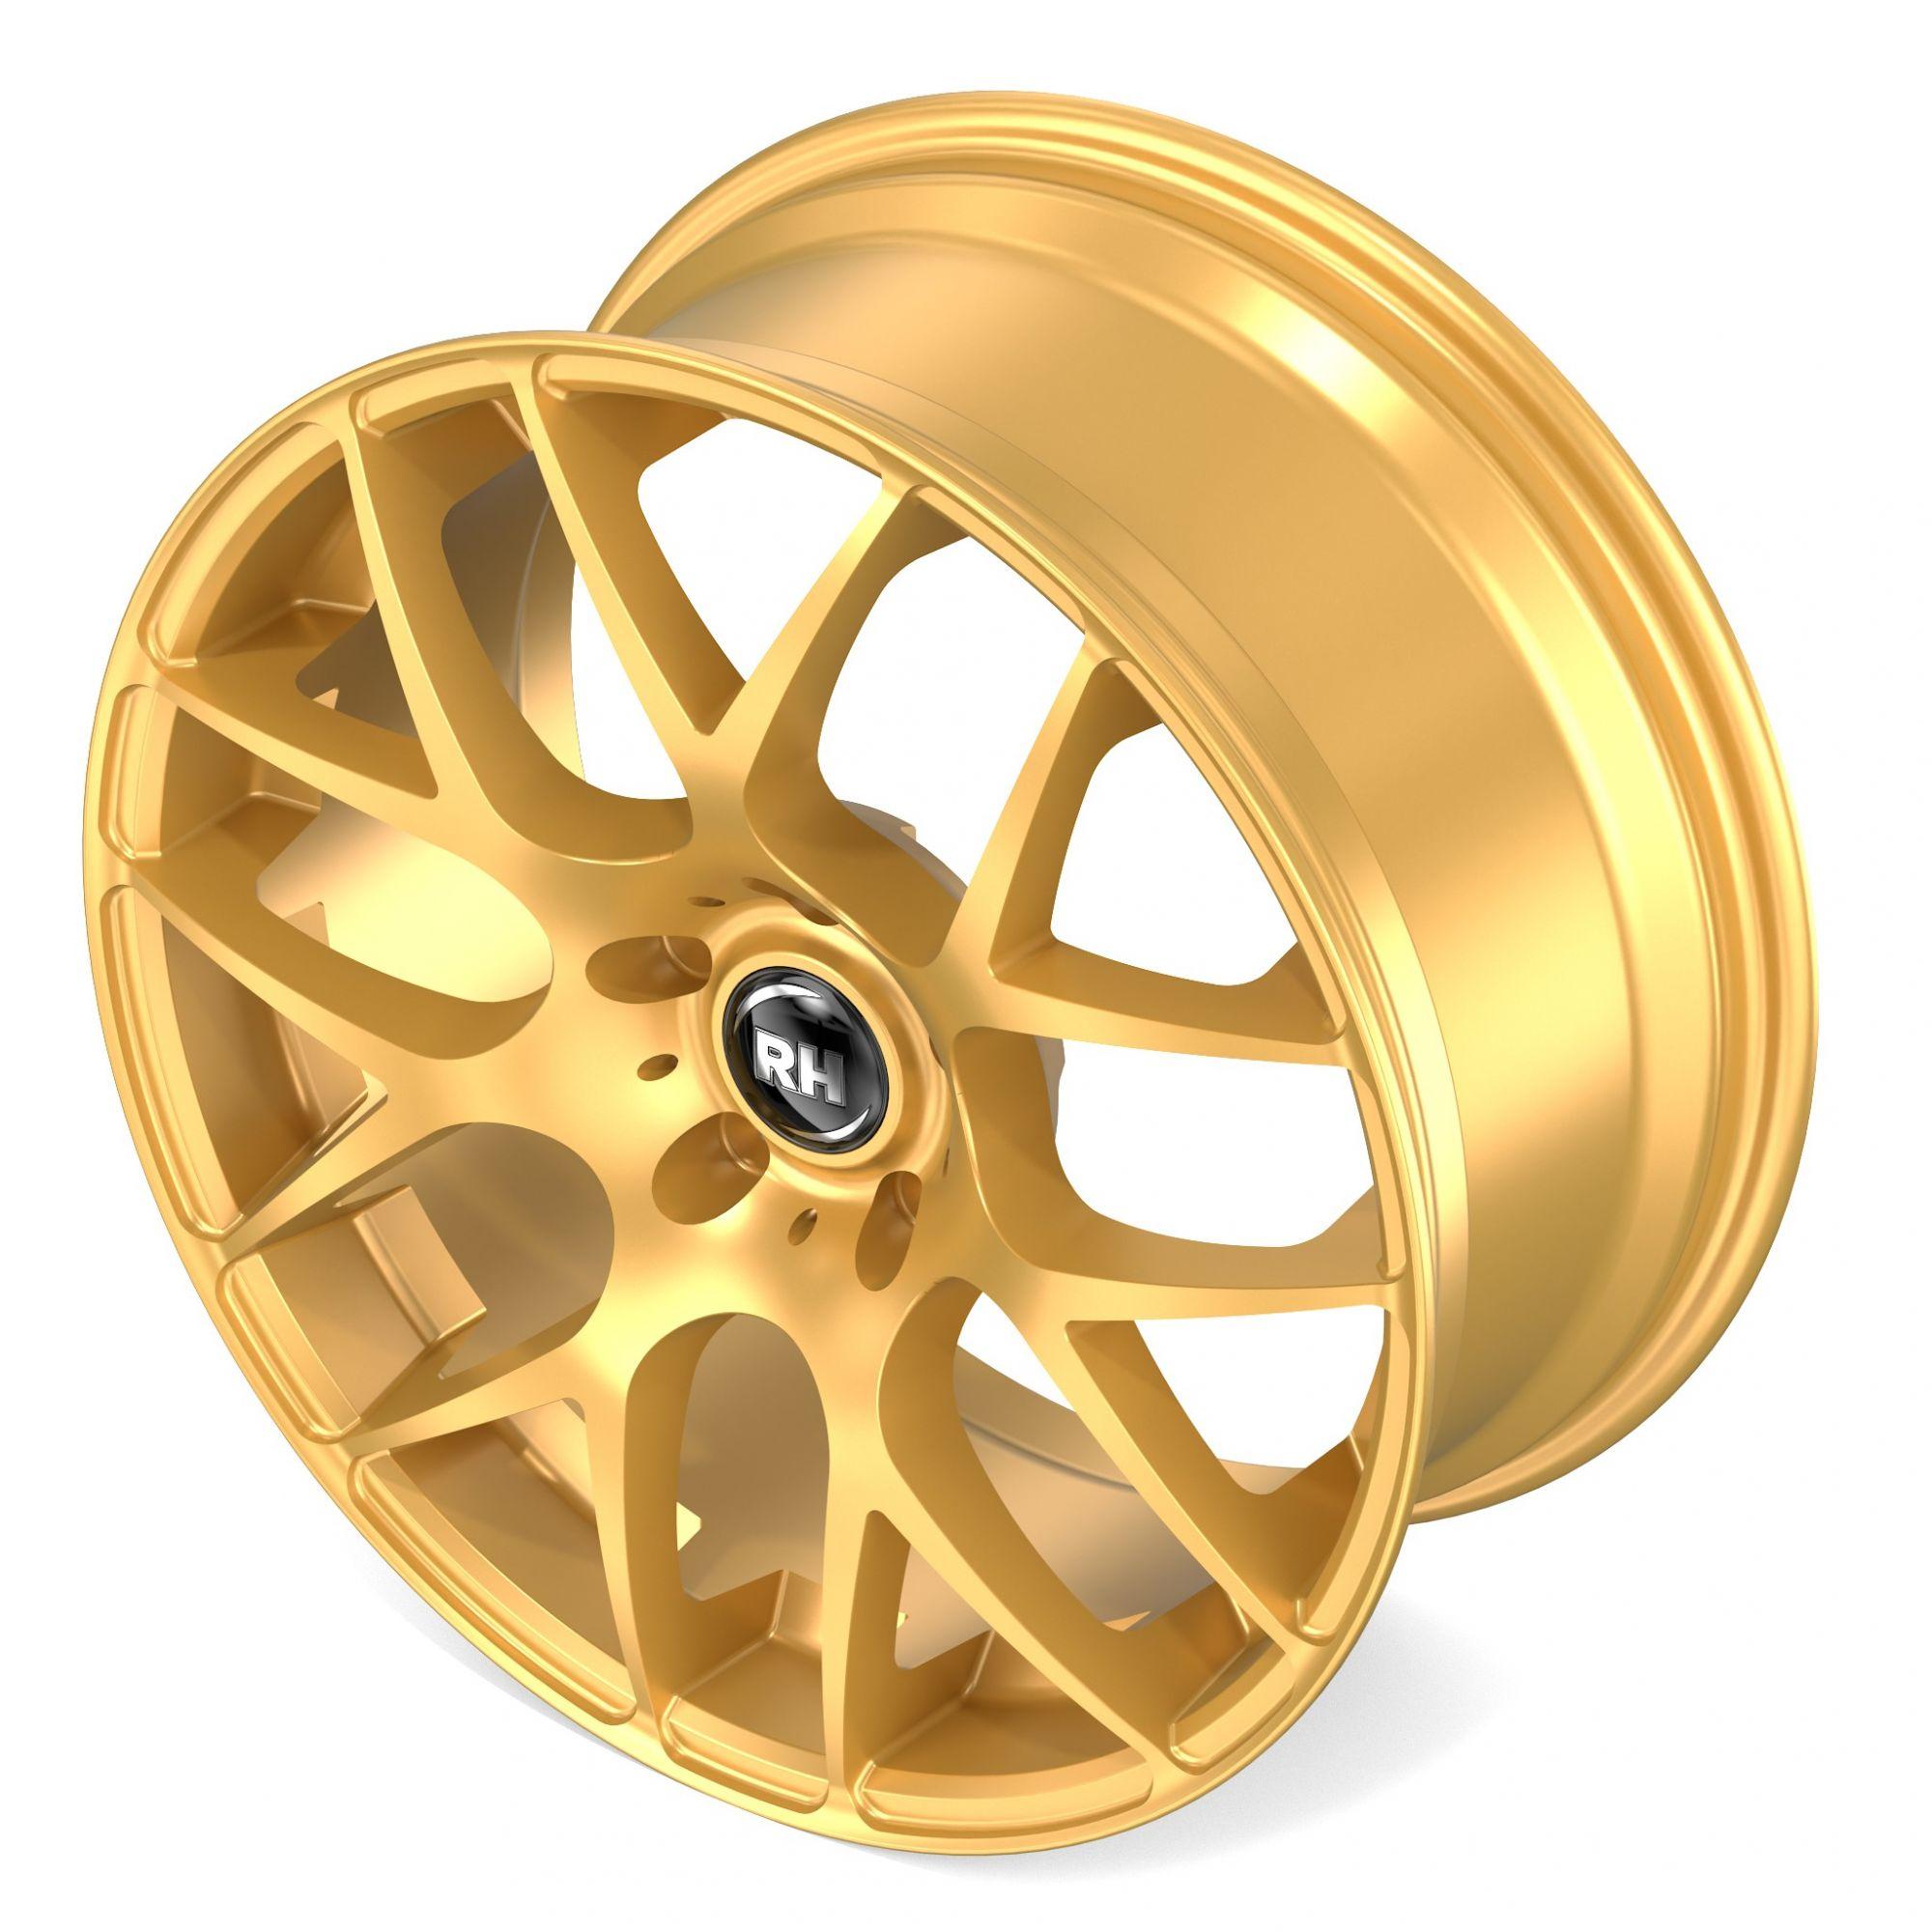 rh alurad nbu race felgen racing gold glanz in 18 zoll. Black Bedroom Furniture Sets. Home Design Ideas